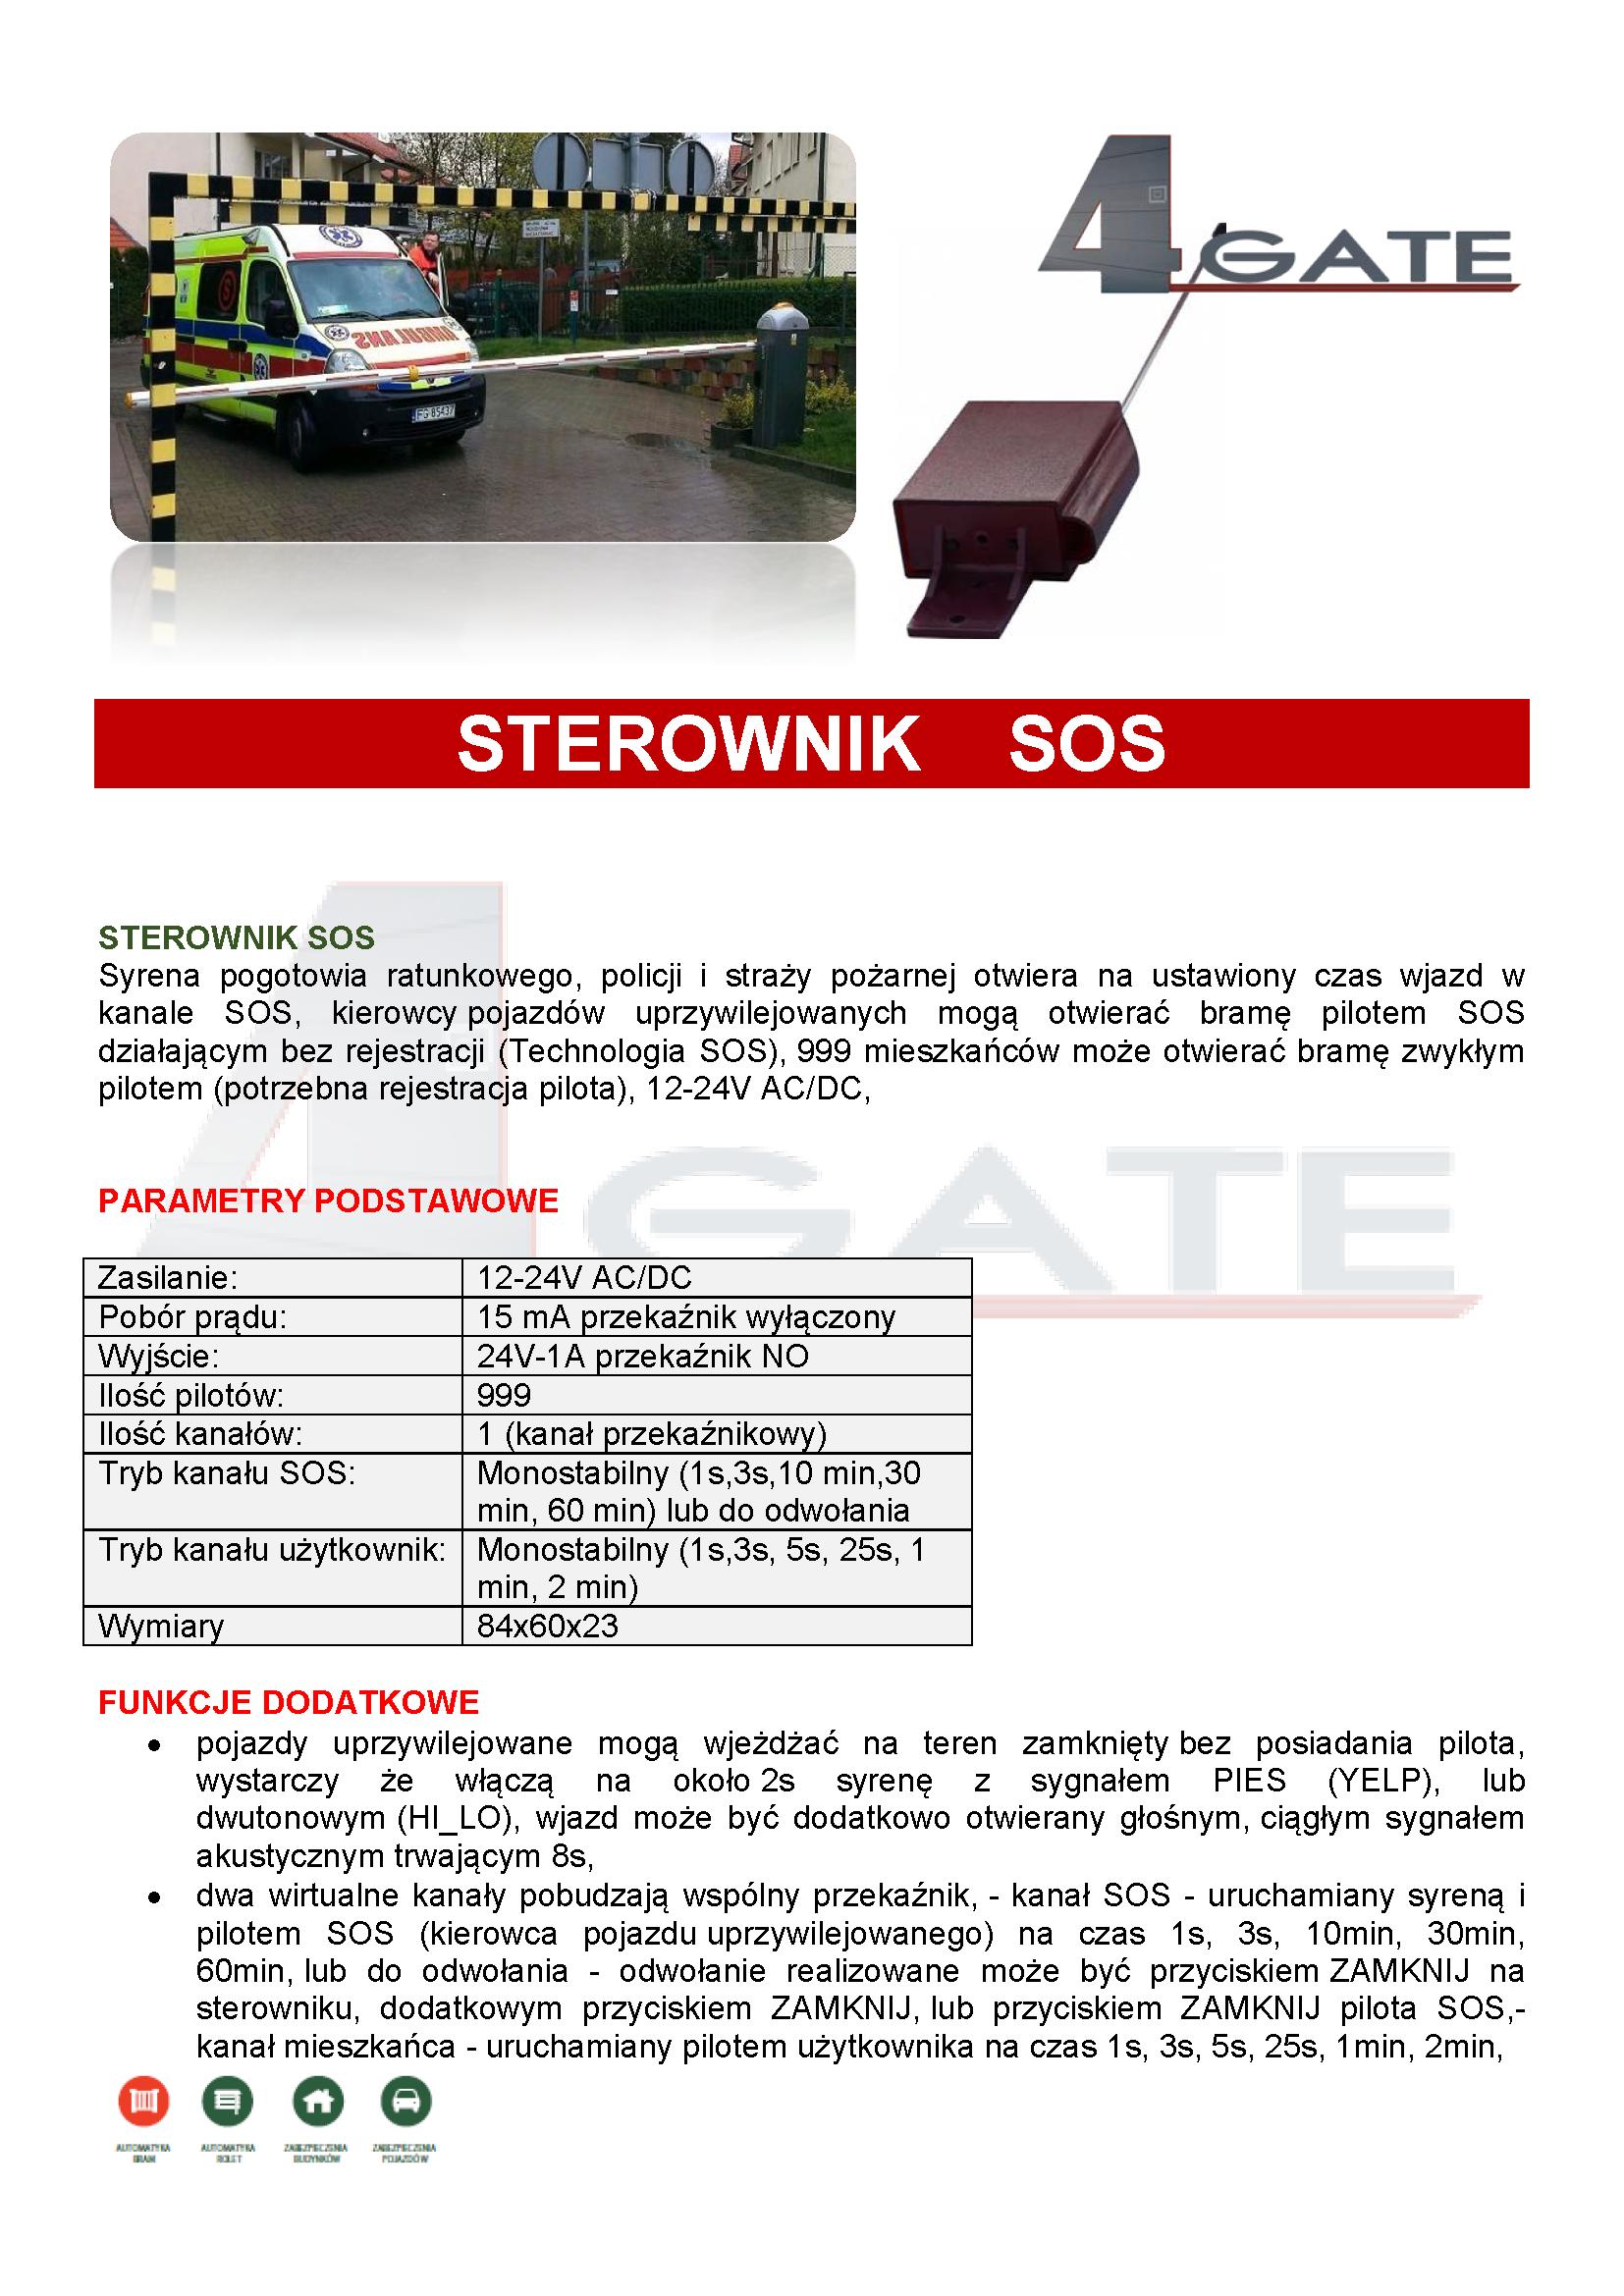 4-gate-sterownik-sos_strona_1